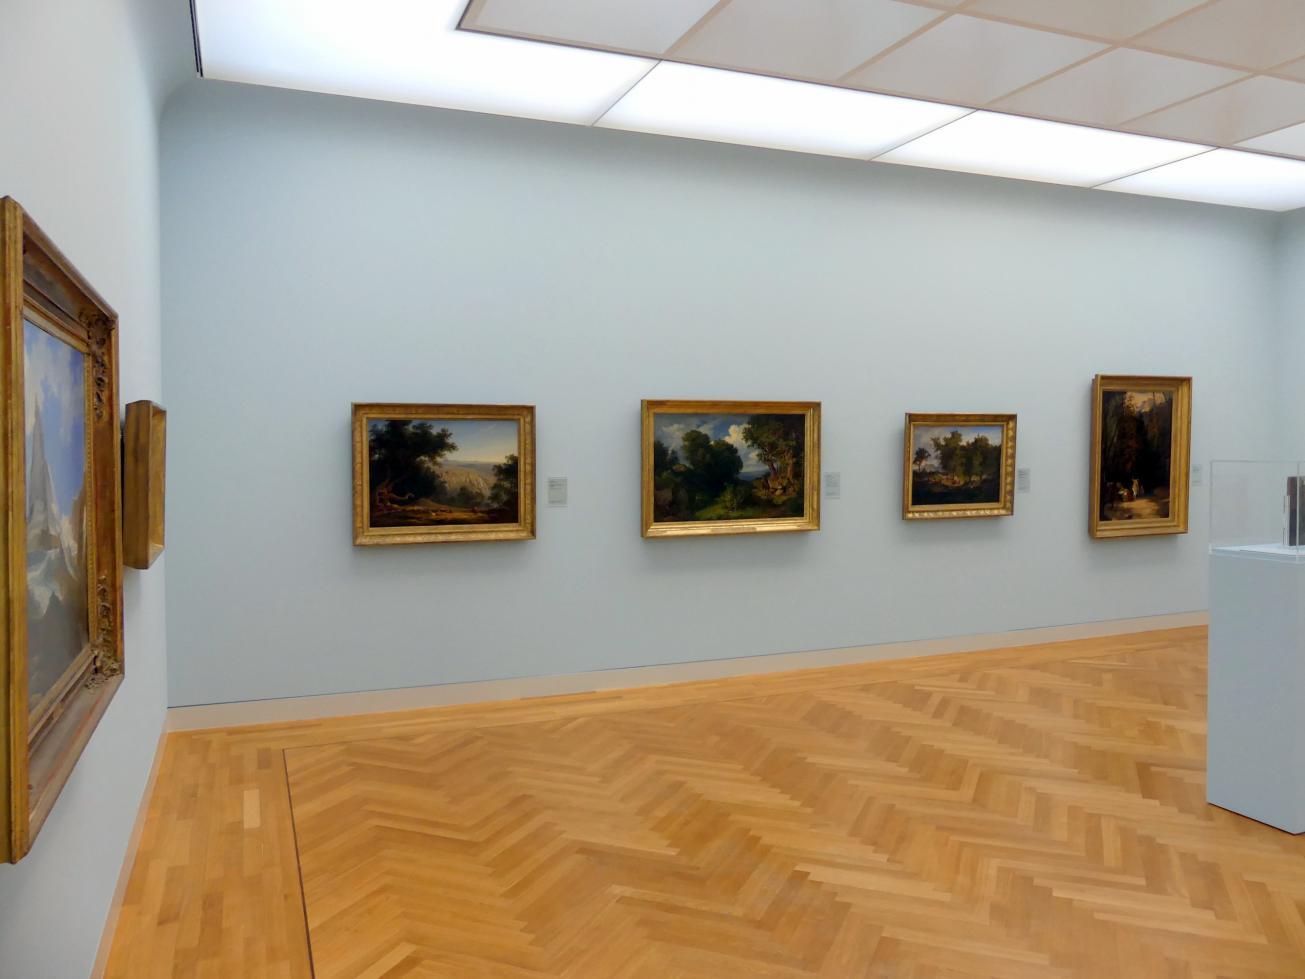 Schweinfurt, Museum Georg Schäfer, Saal 17